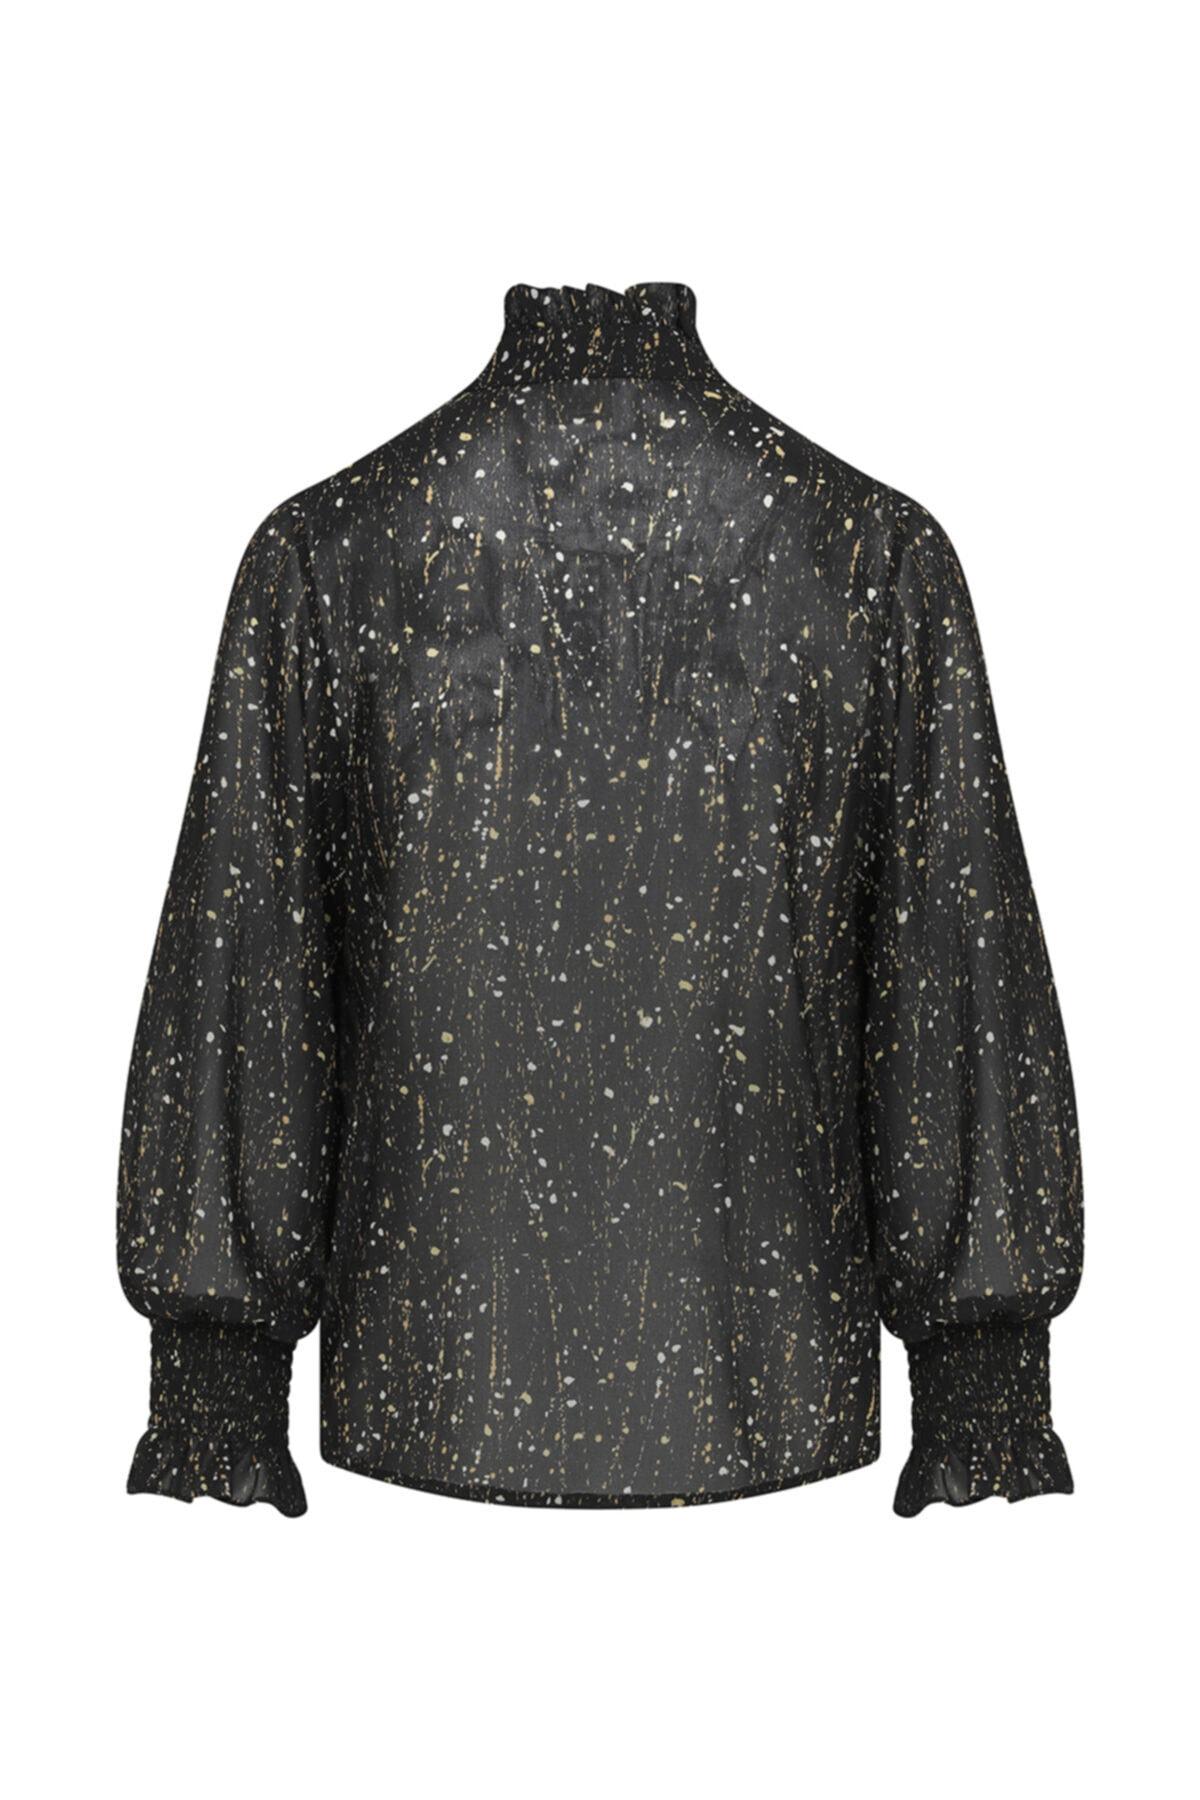 W Collection Kolları Içten Elastikli Desenli Bluz 2